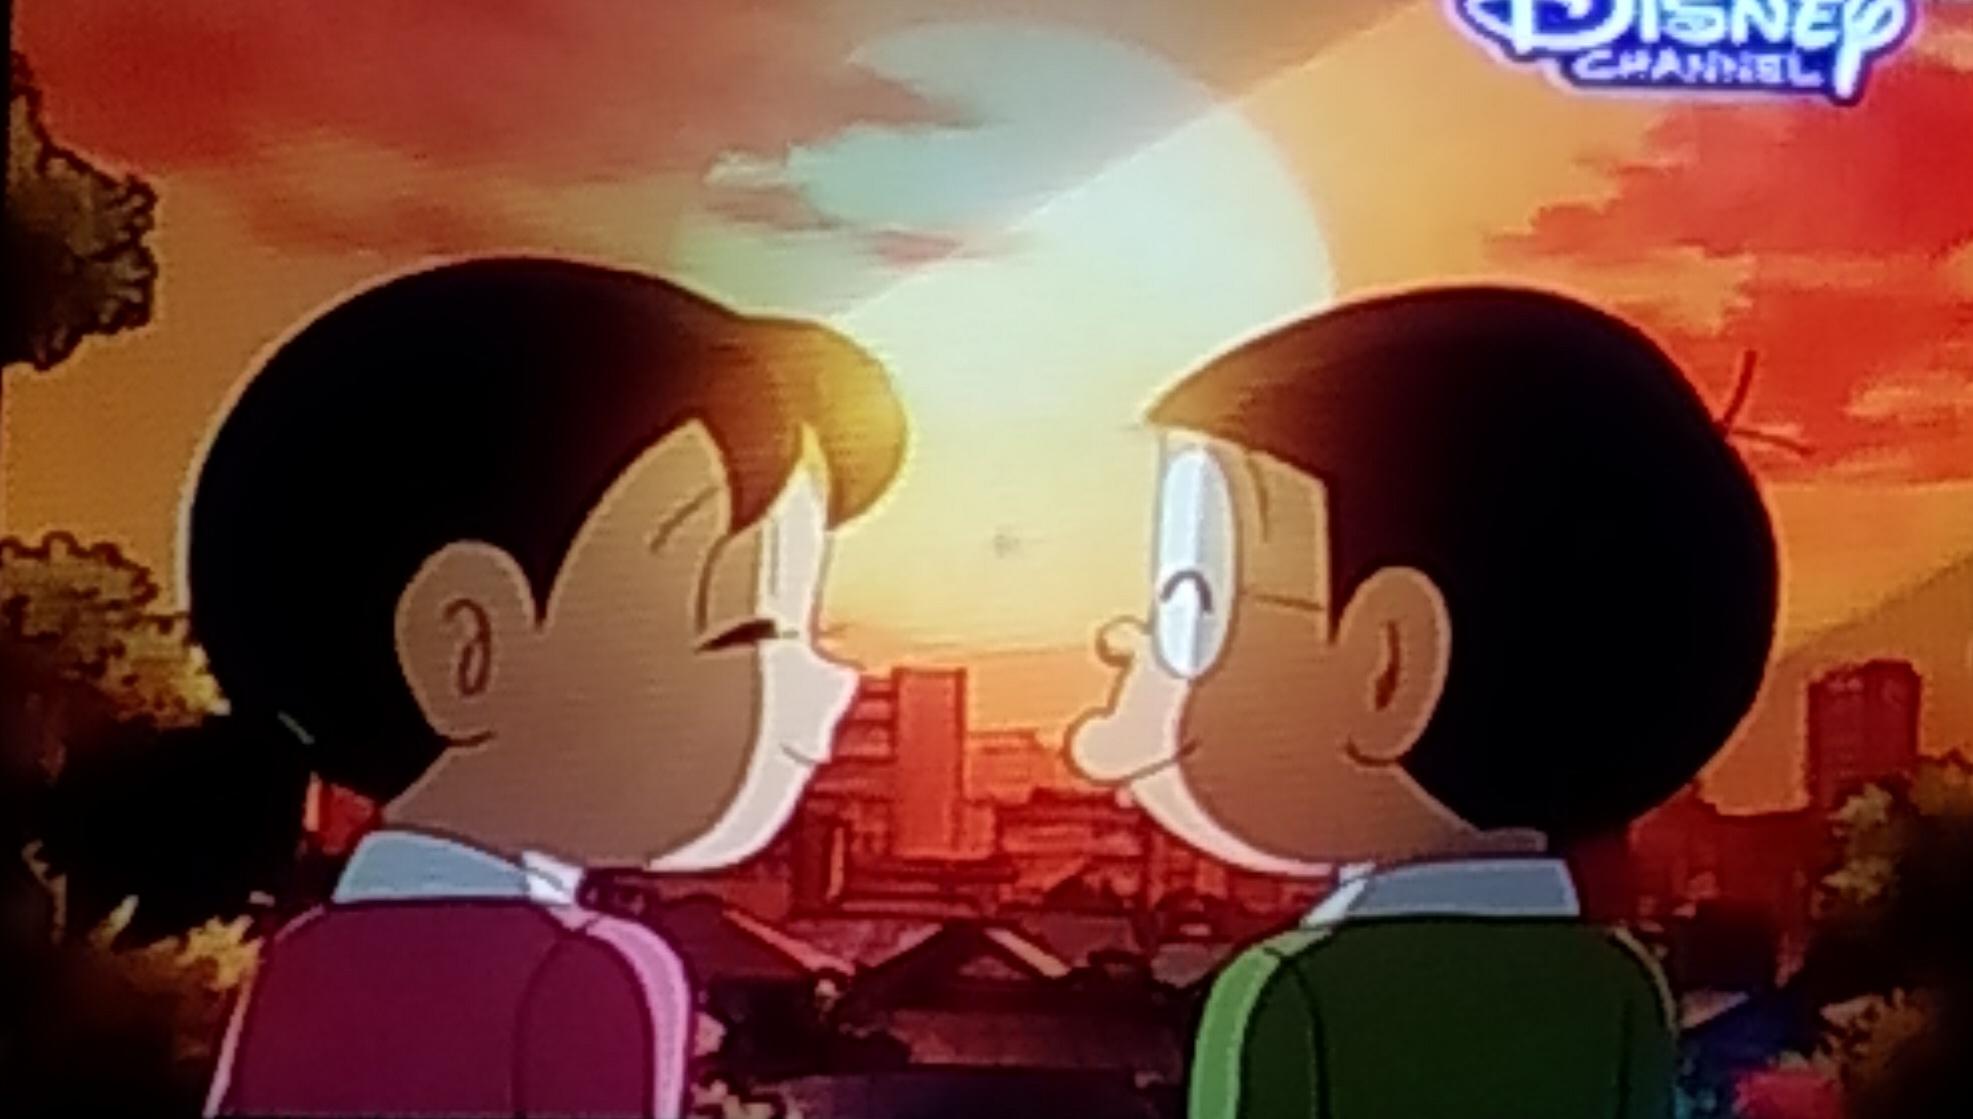 11+ Nobita HD Wallpapers on WallpaperSafari